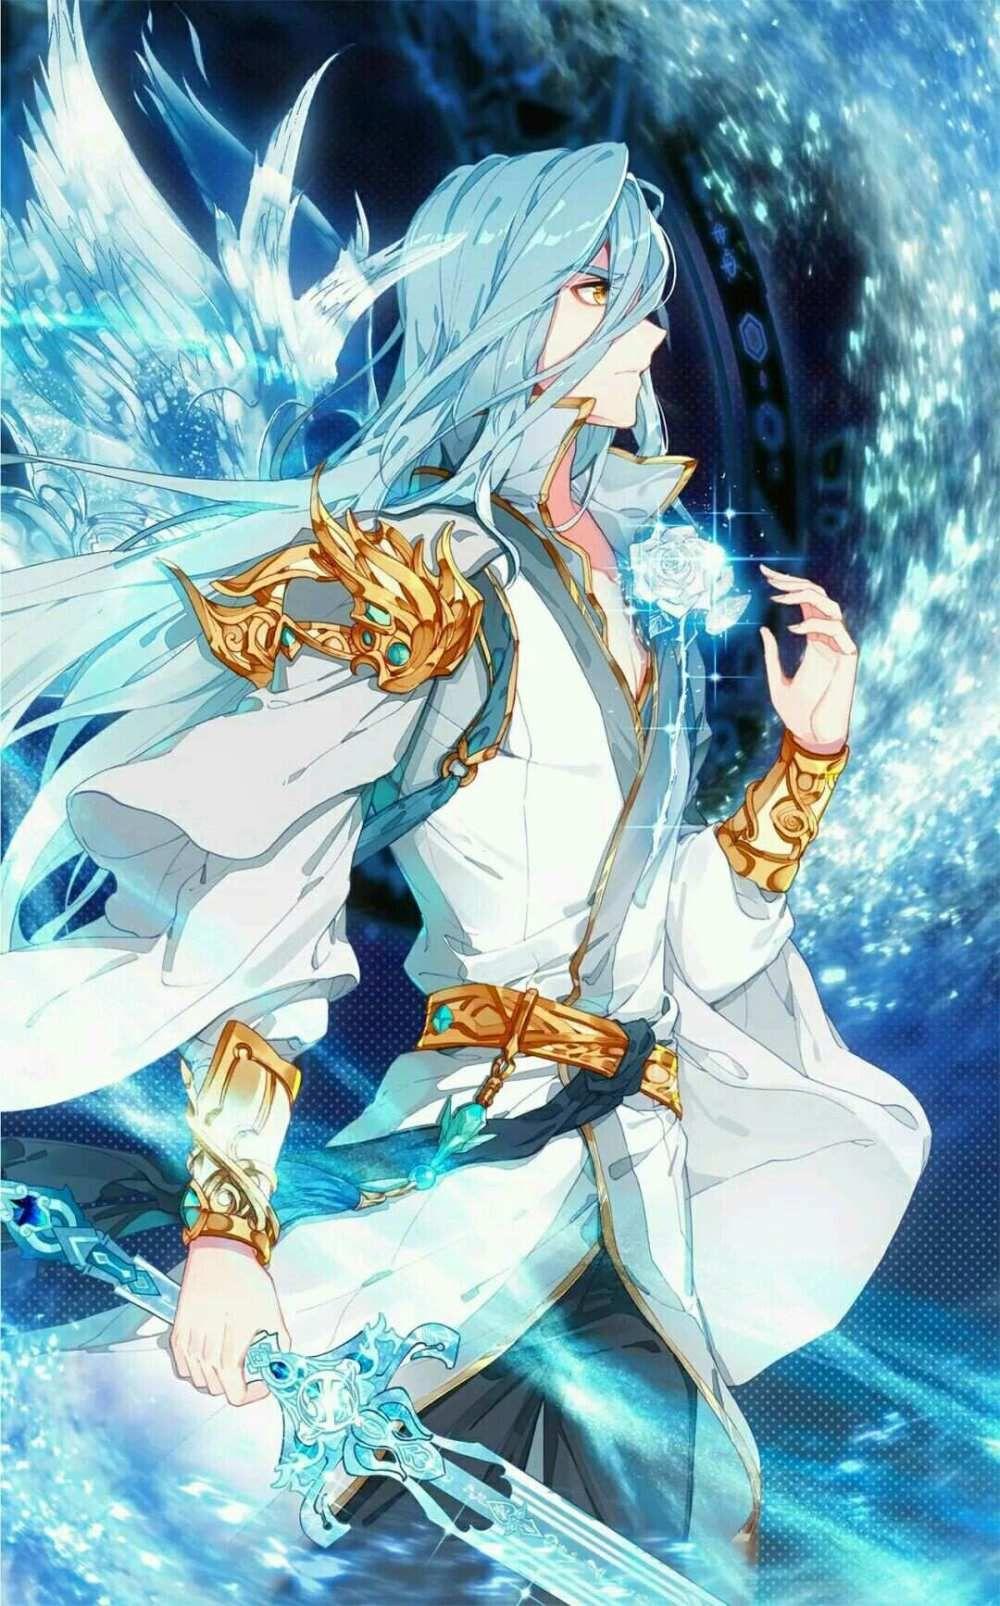 Soul Land 3 Wu Zhangkong In 2019 Anime Art Anime Guys Anime